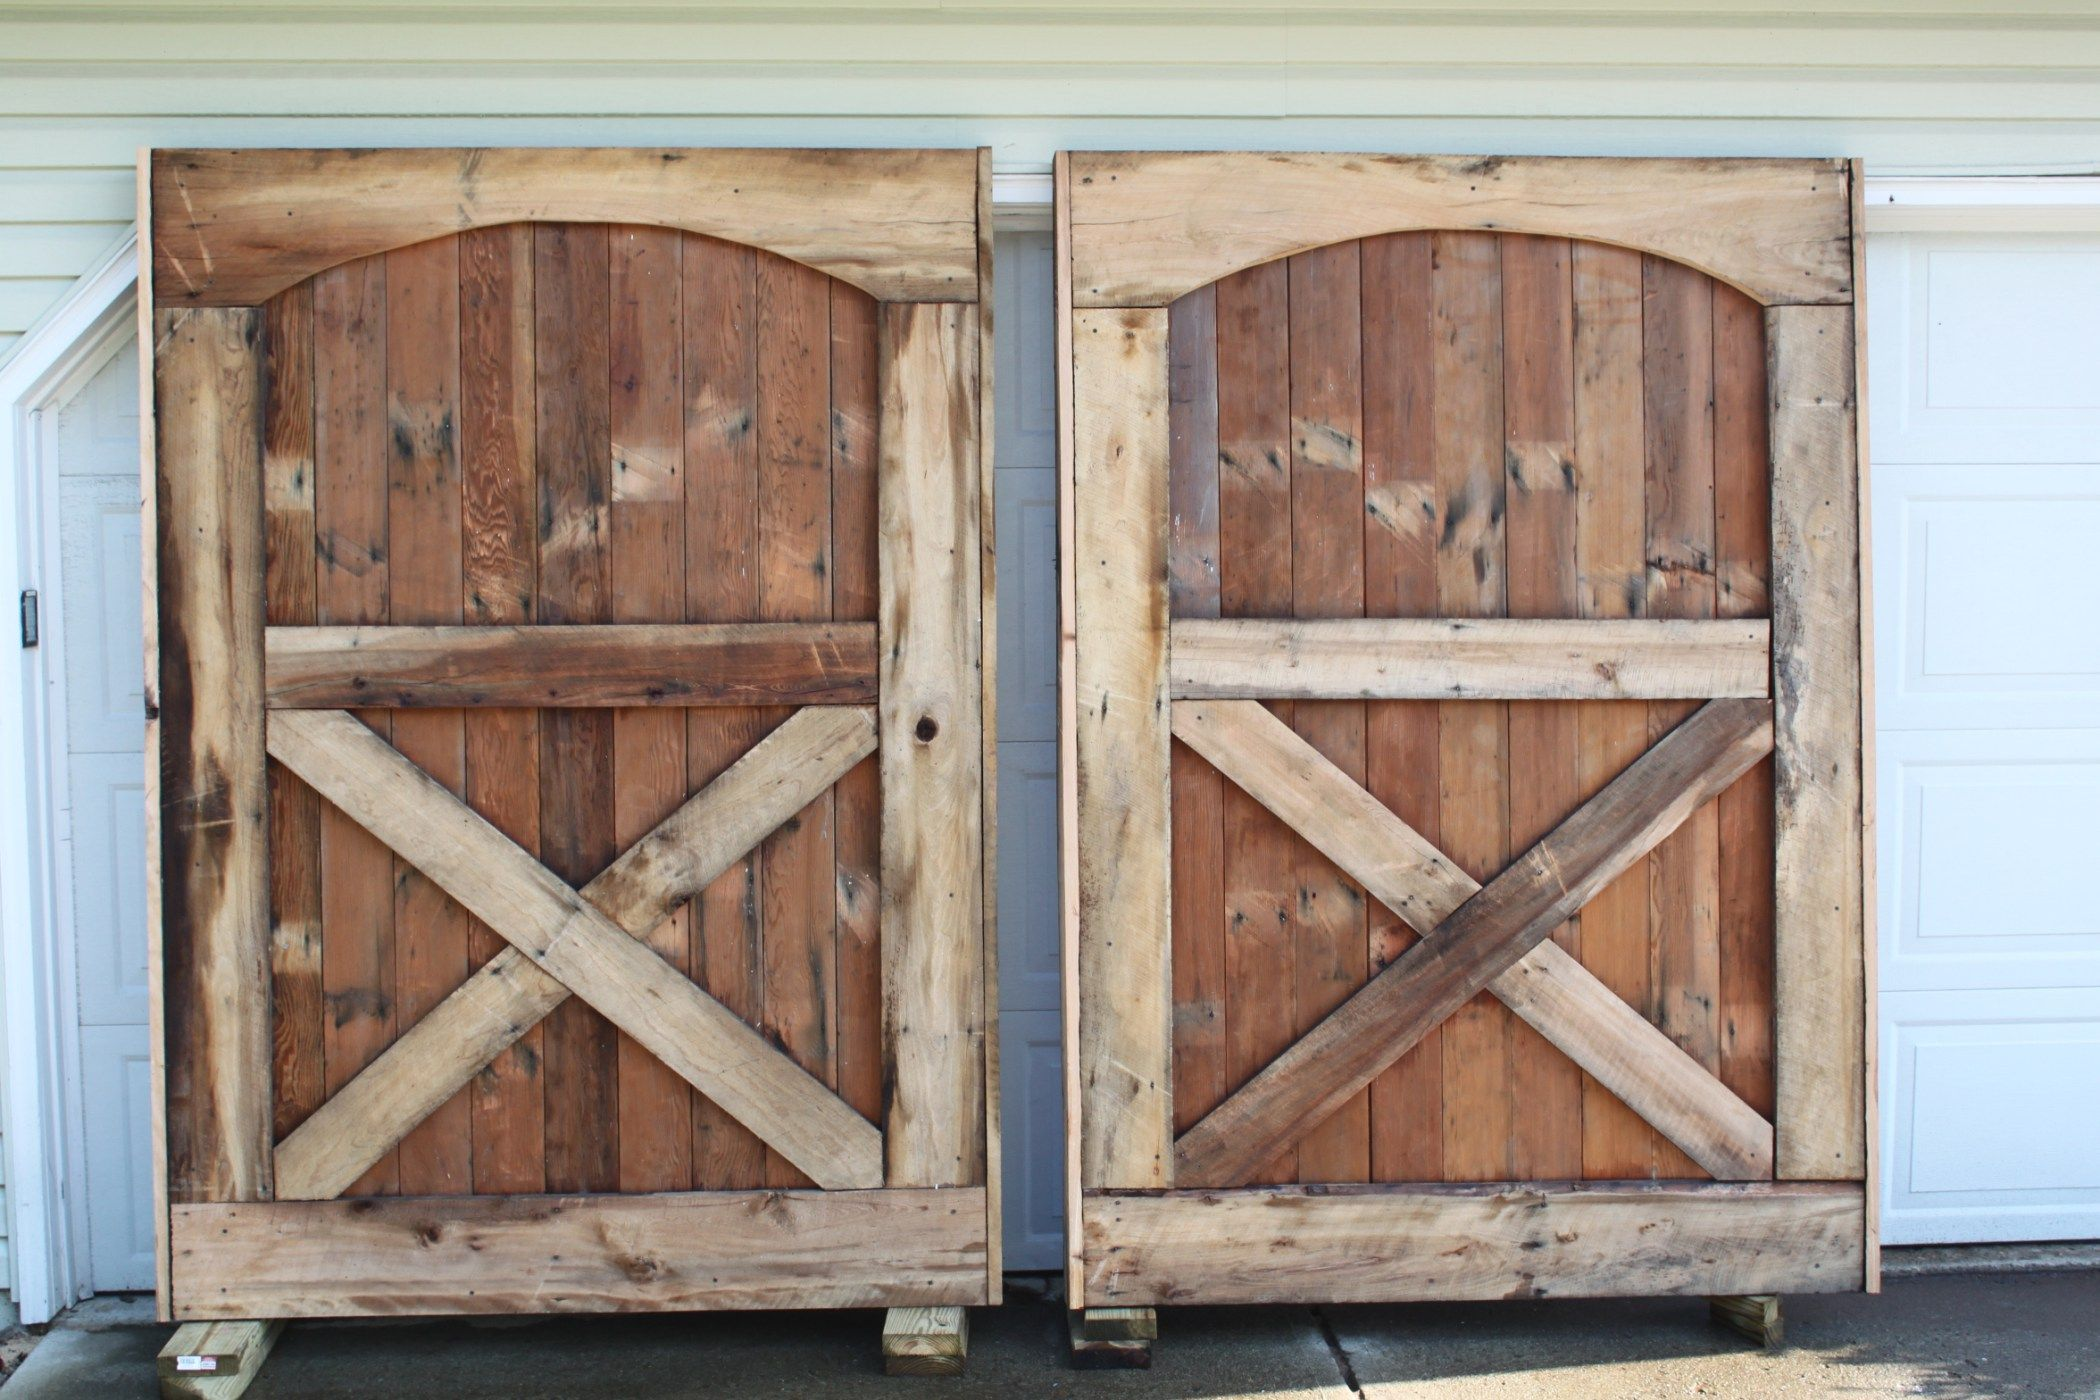 How To Build A Rustic Barn Door Headboard Barn Door Headboards